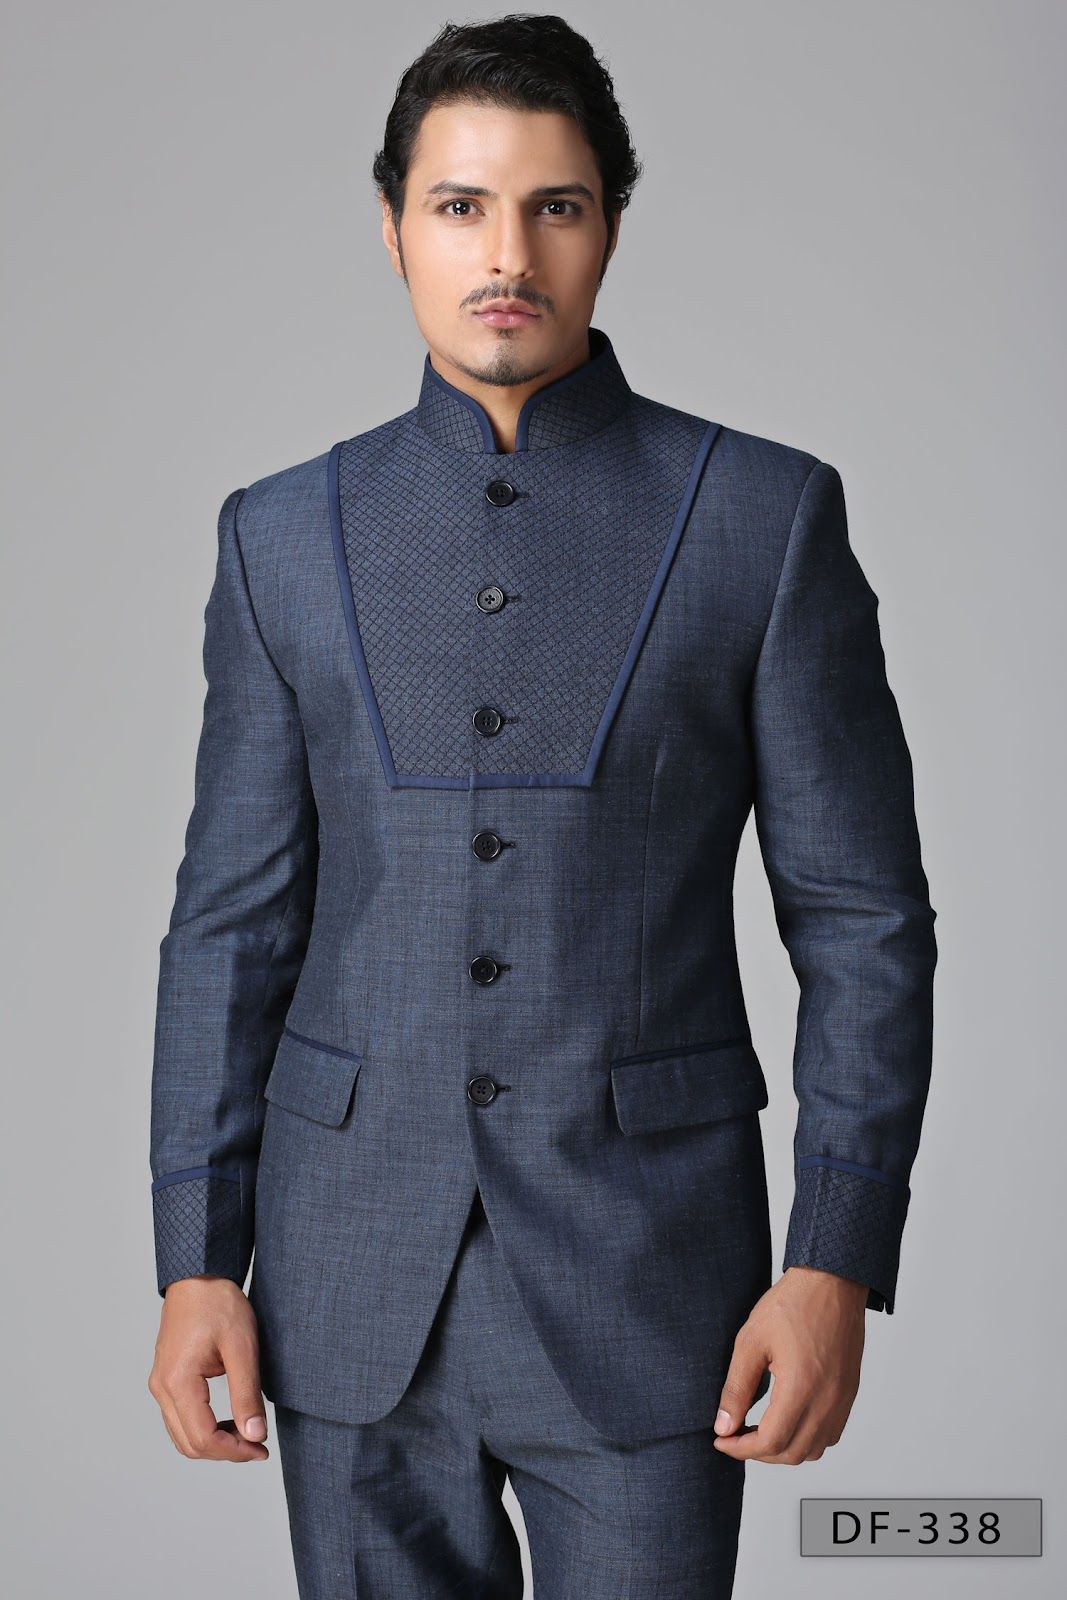 different suits for men | Modern 3 Piece Suits for Men ...